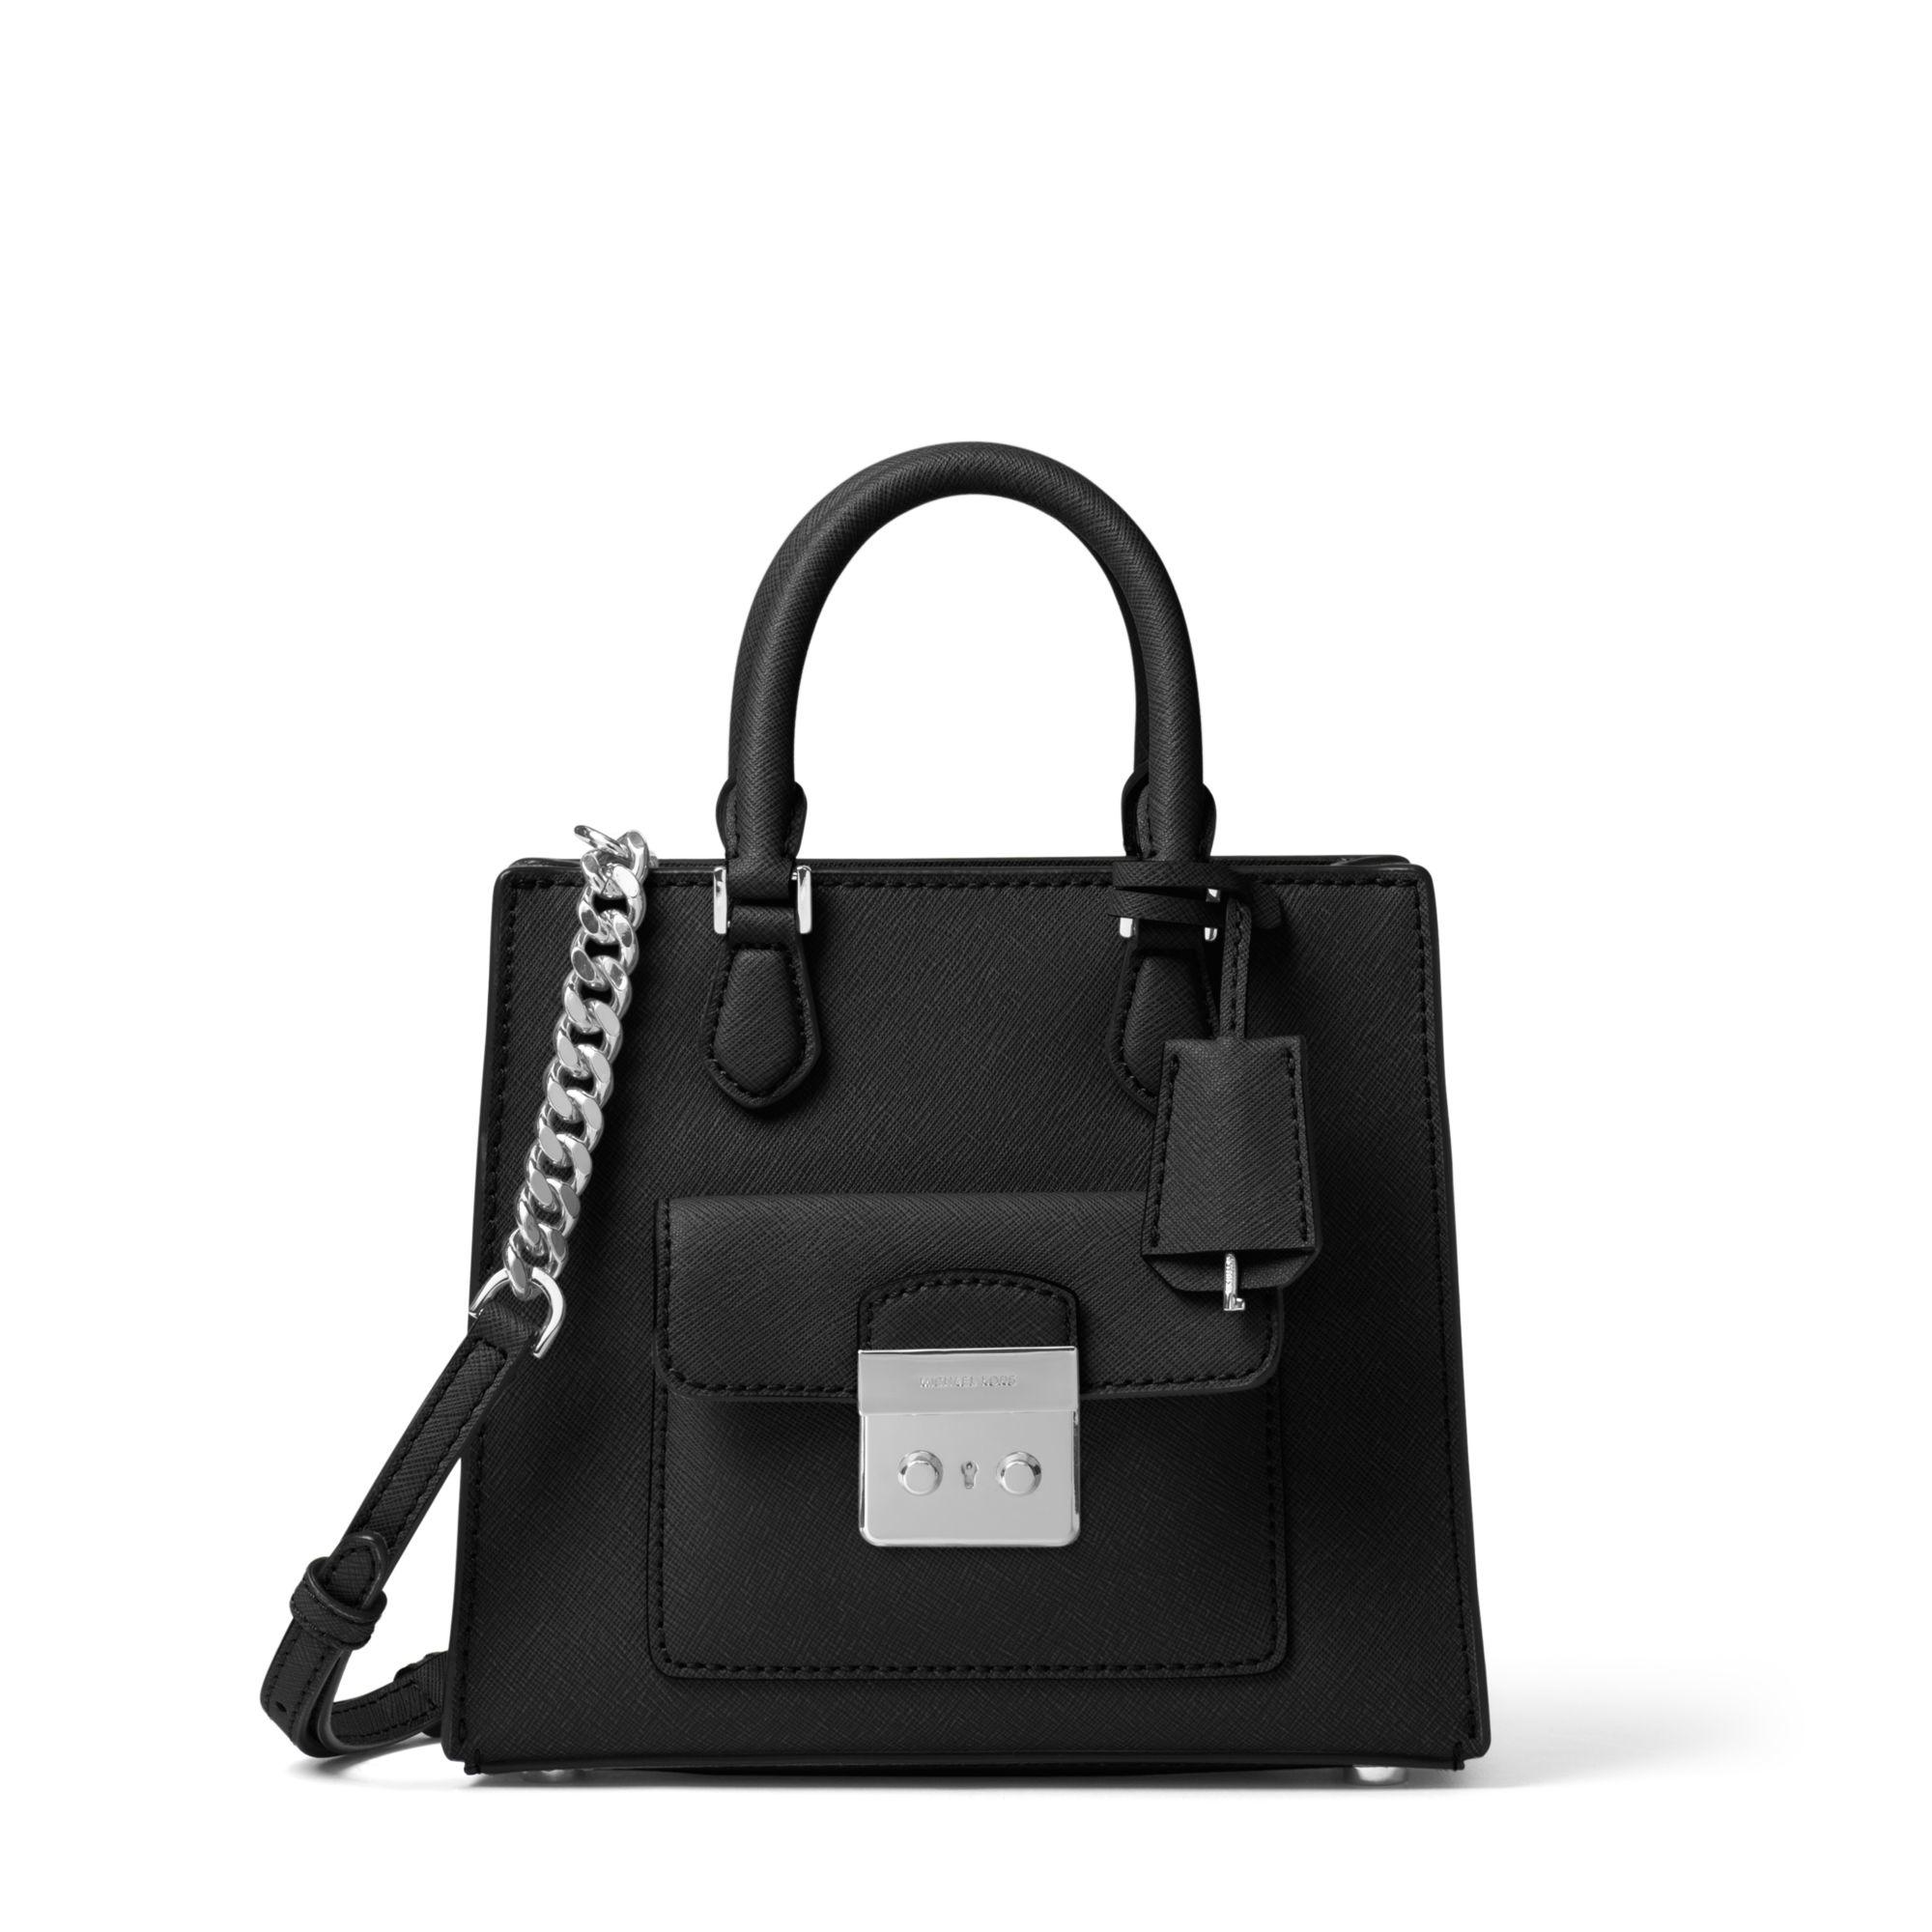 6d4280fca9f733 Michael Kors Bridgette Small Saffiano Leather Crossbody Bag in Black ...